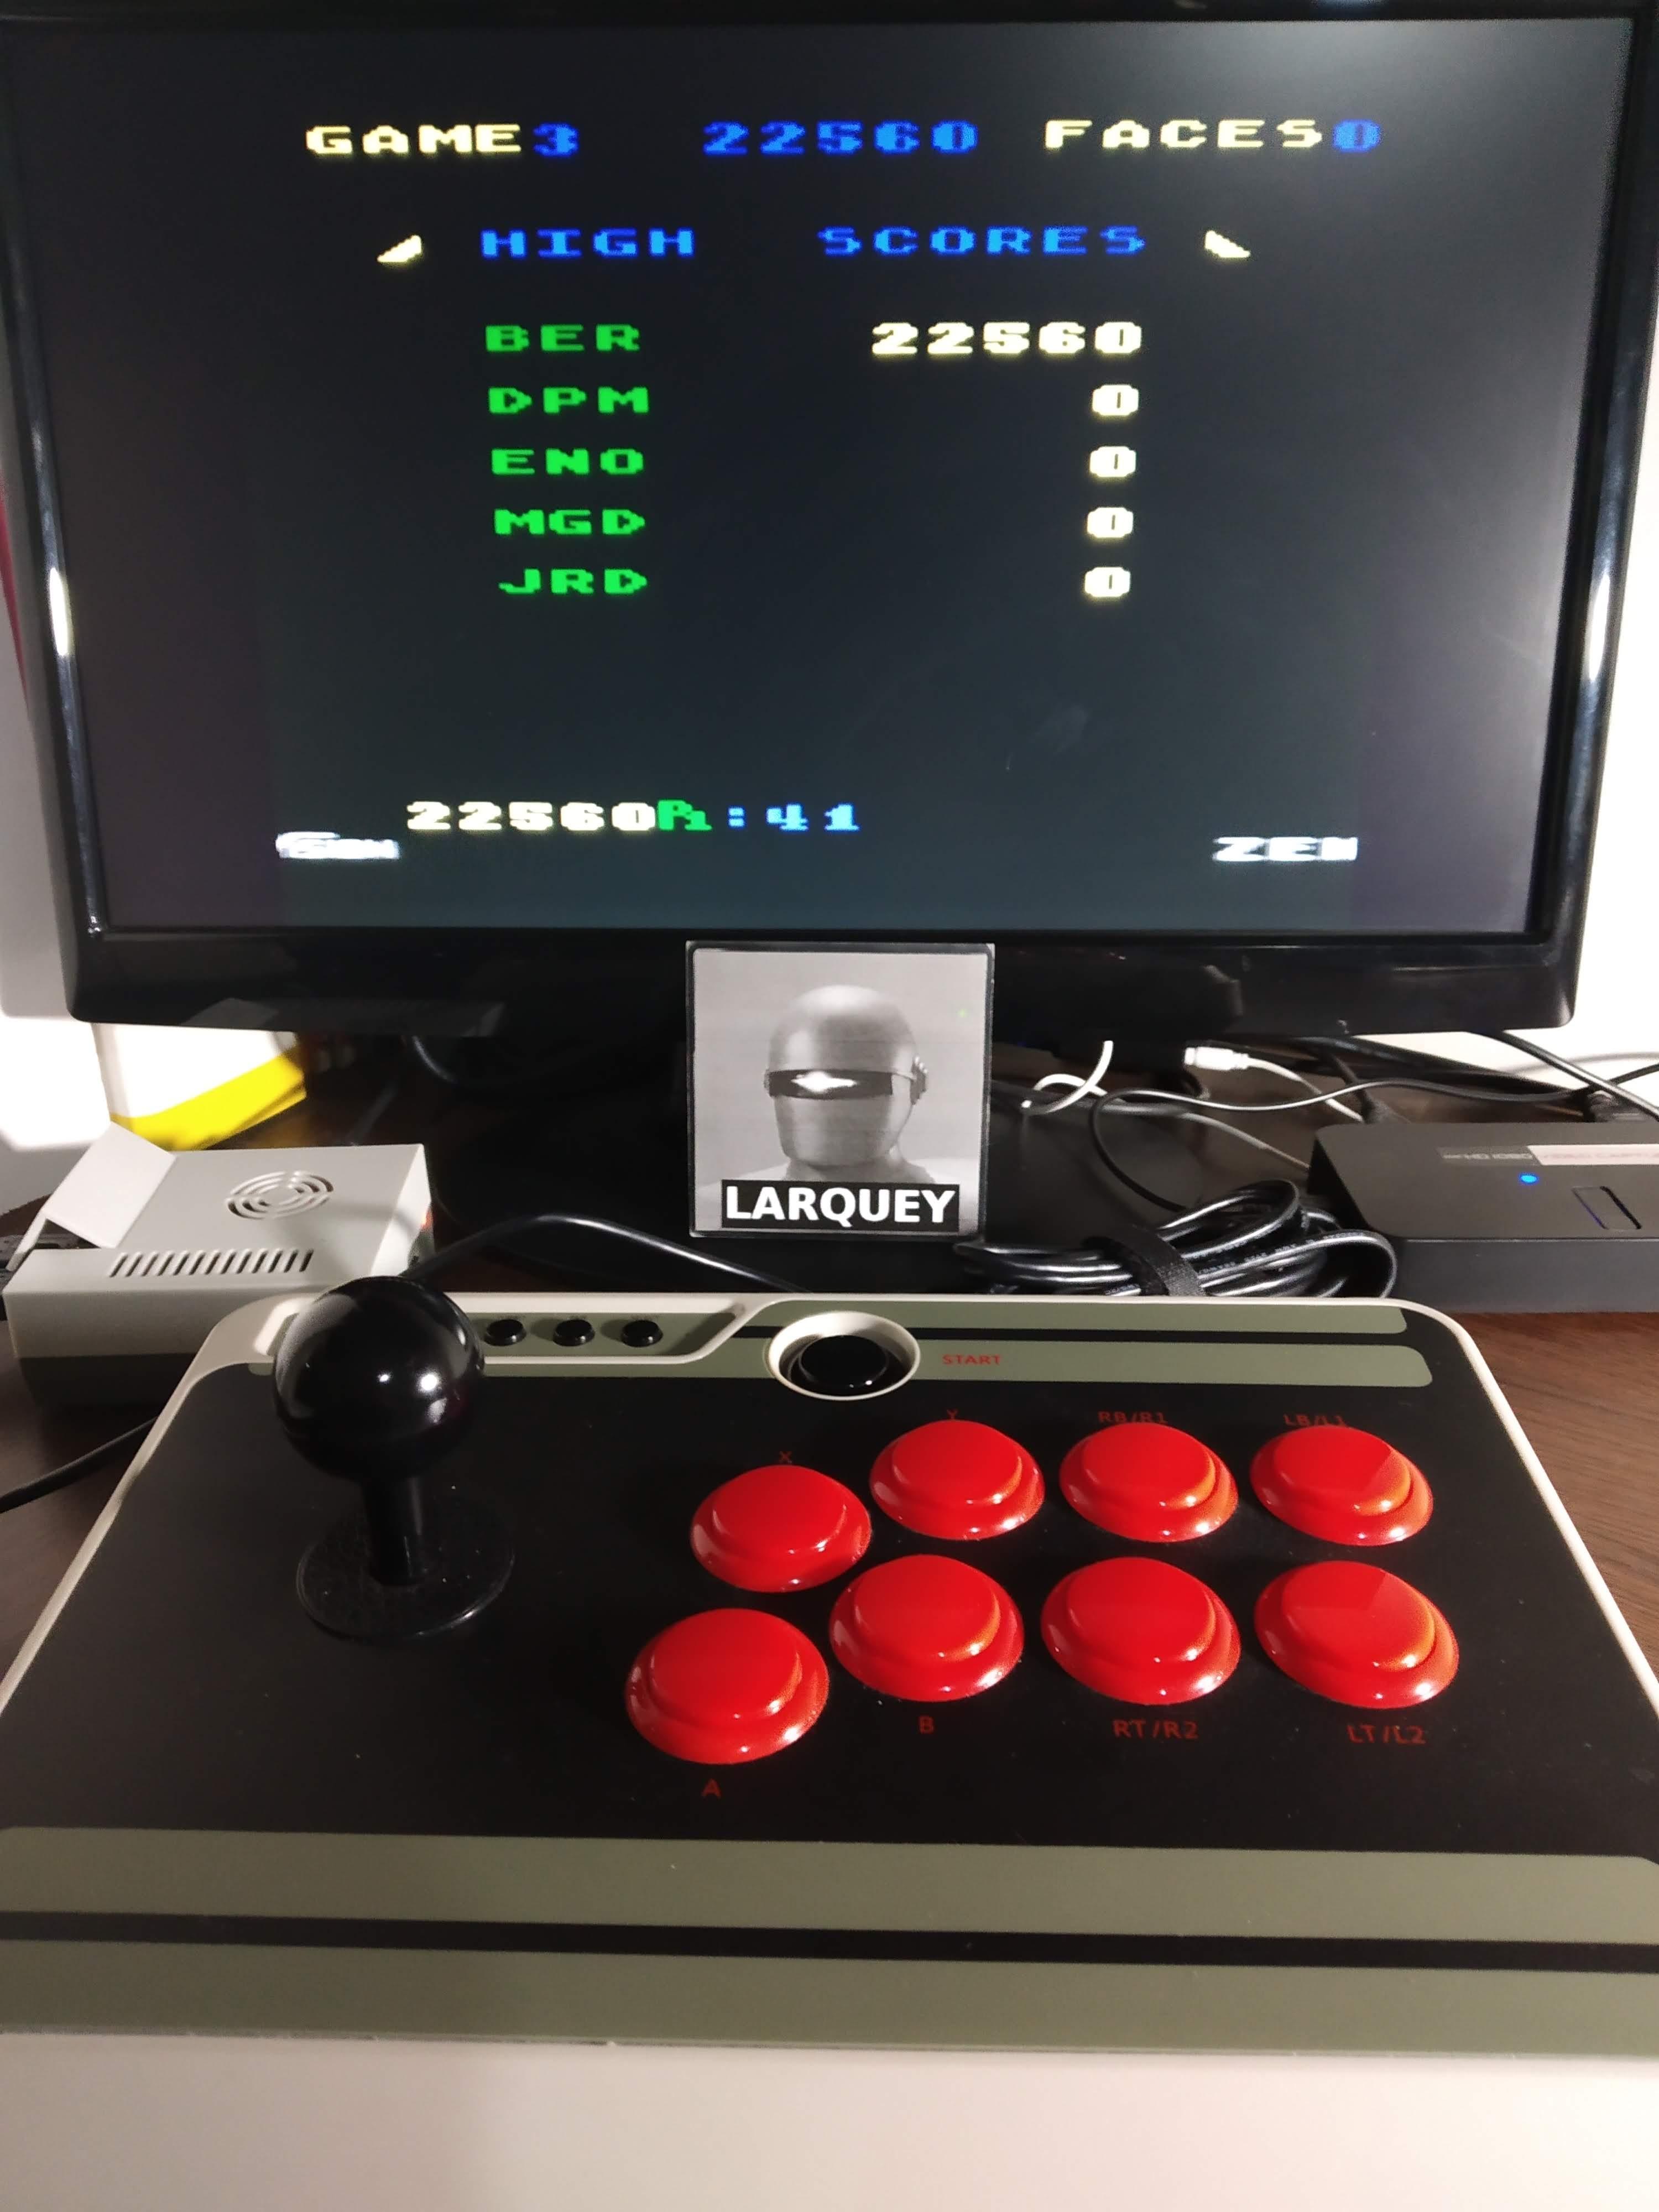 Larquey: Zenji: Game 3 (Atari 5200 Emulated) 22,560 points on 2019-11-13 13:09:32